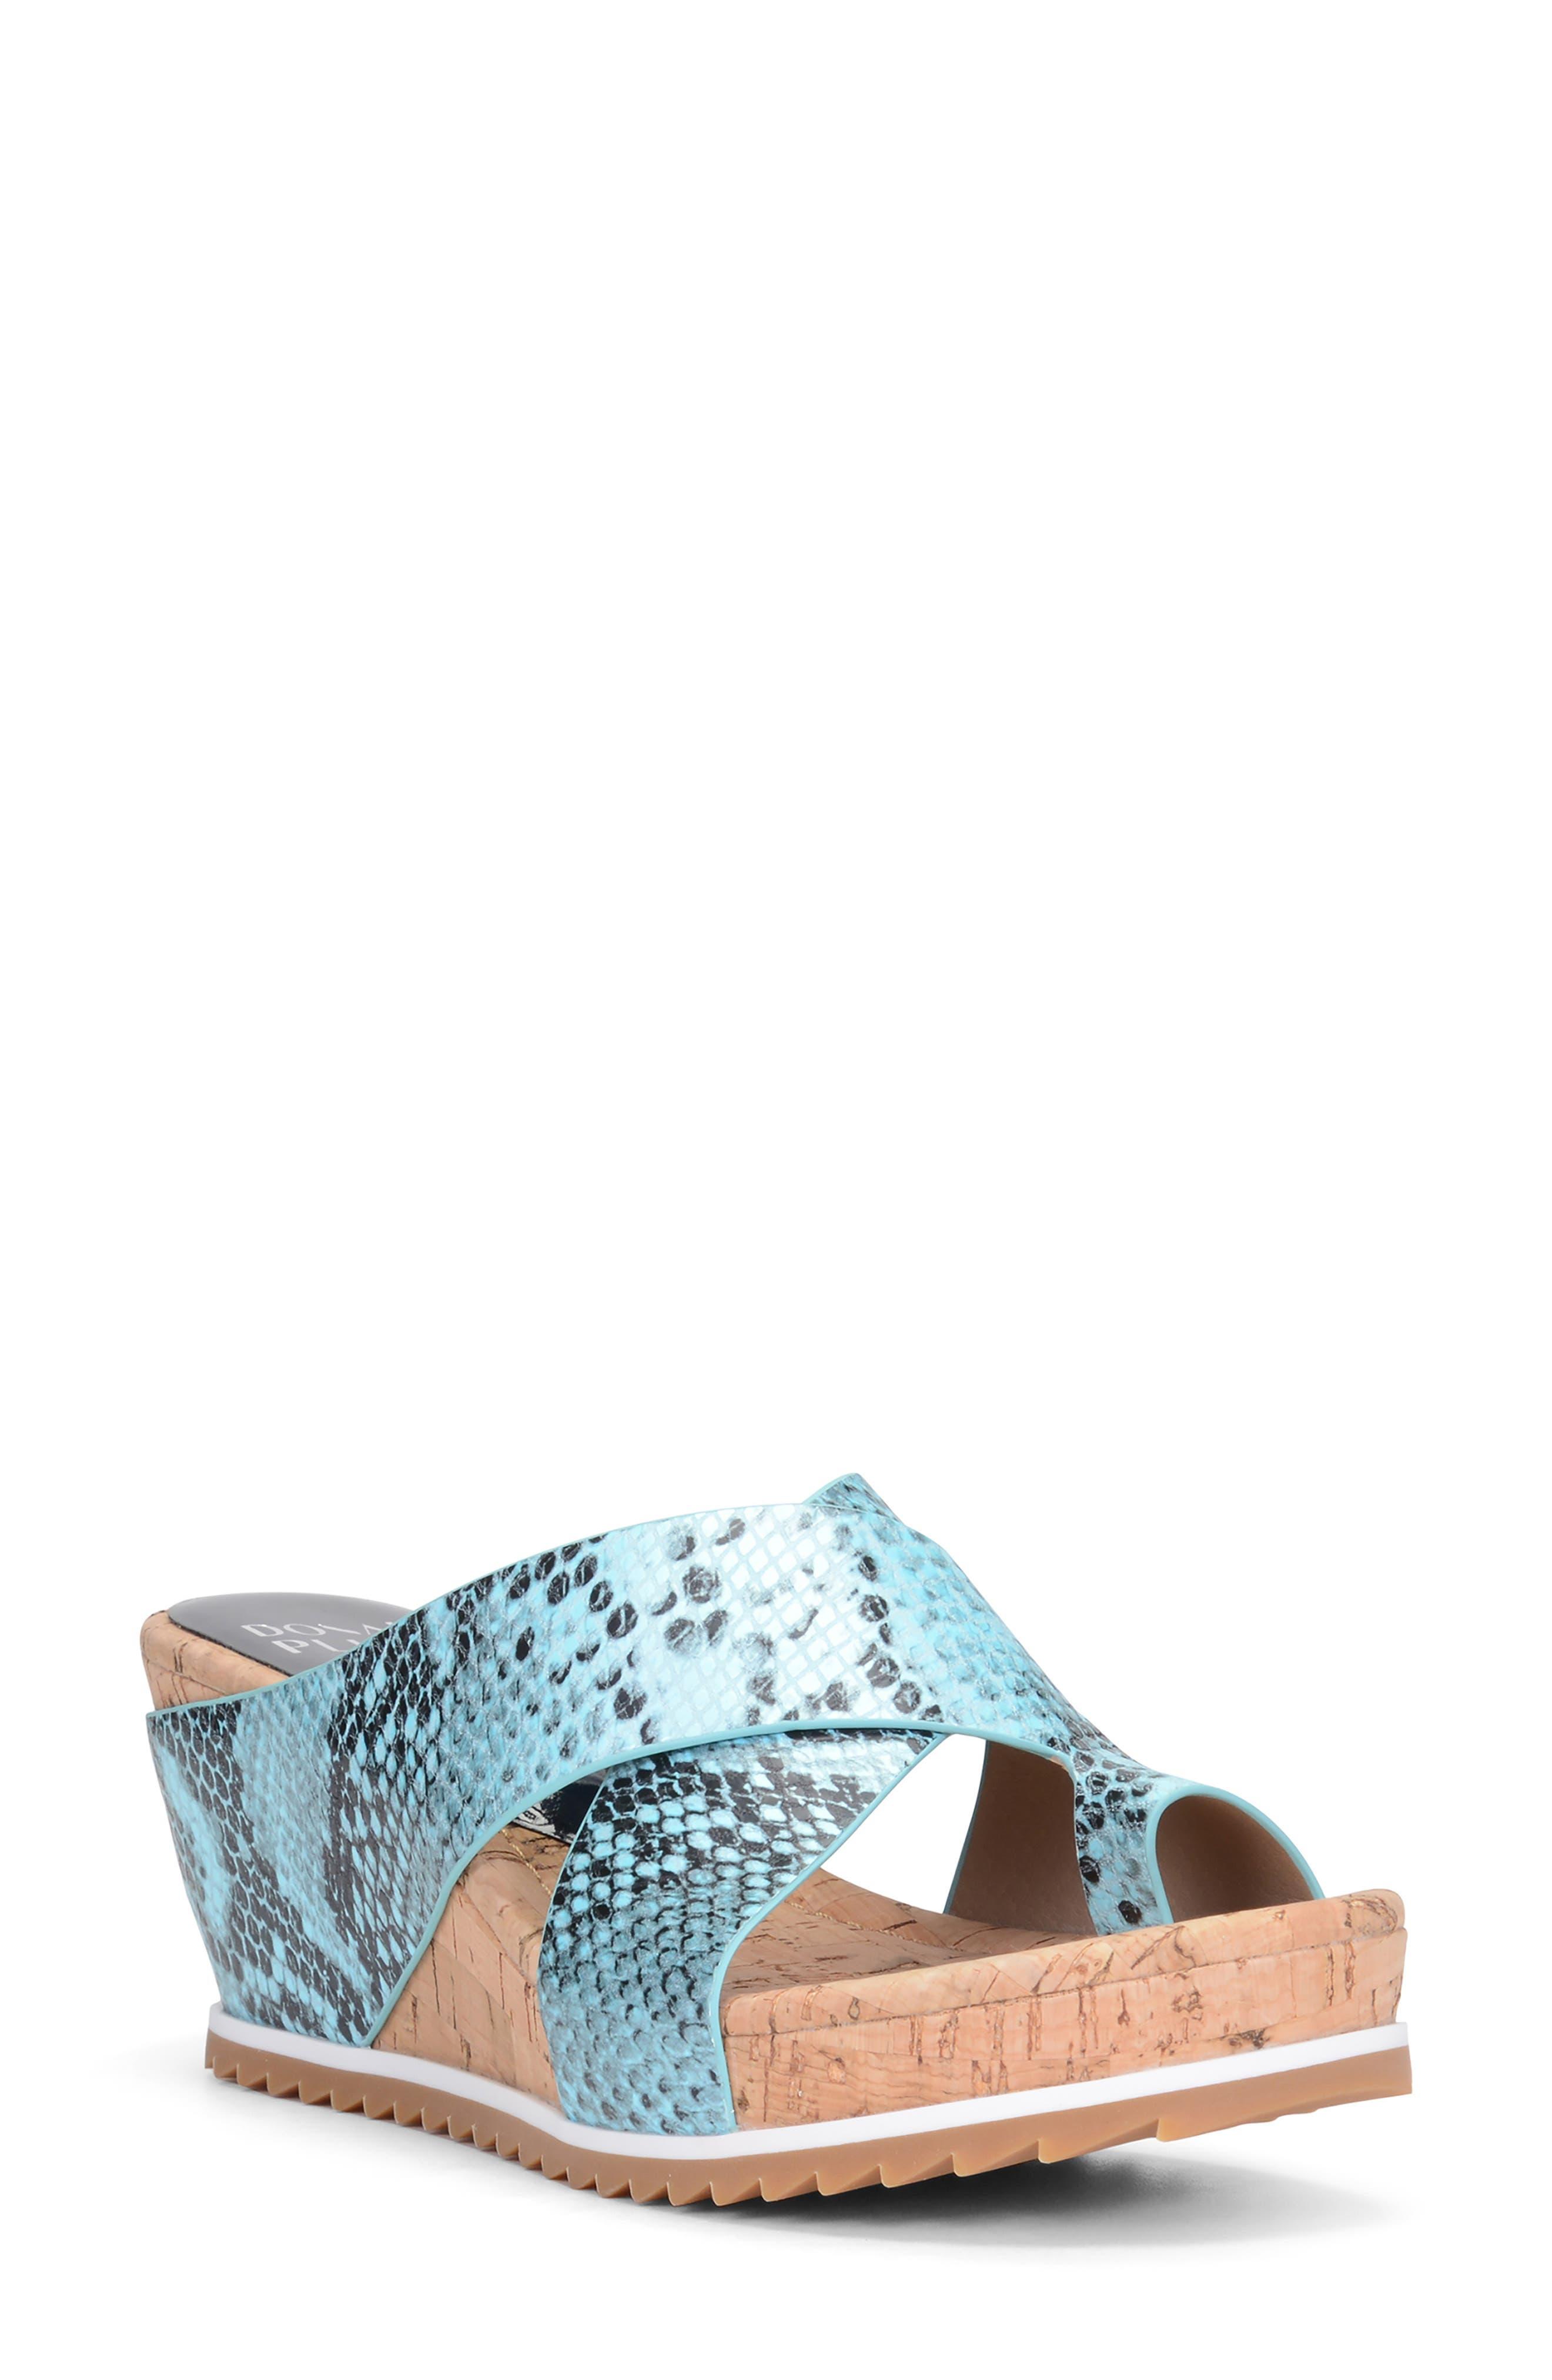 Sisu Wedge Slide Sandal